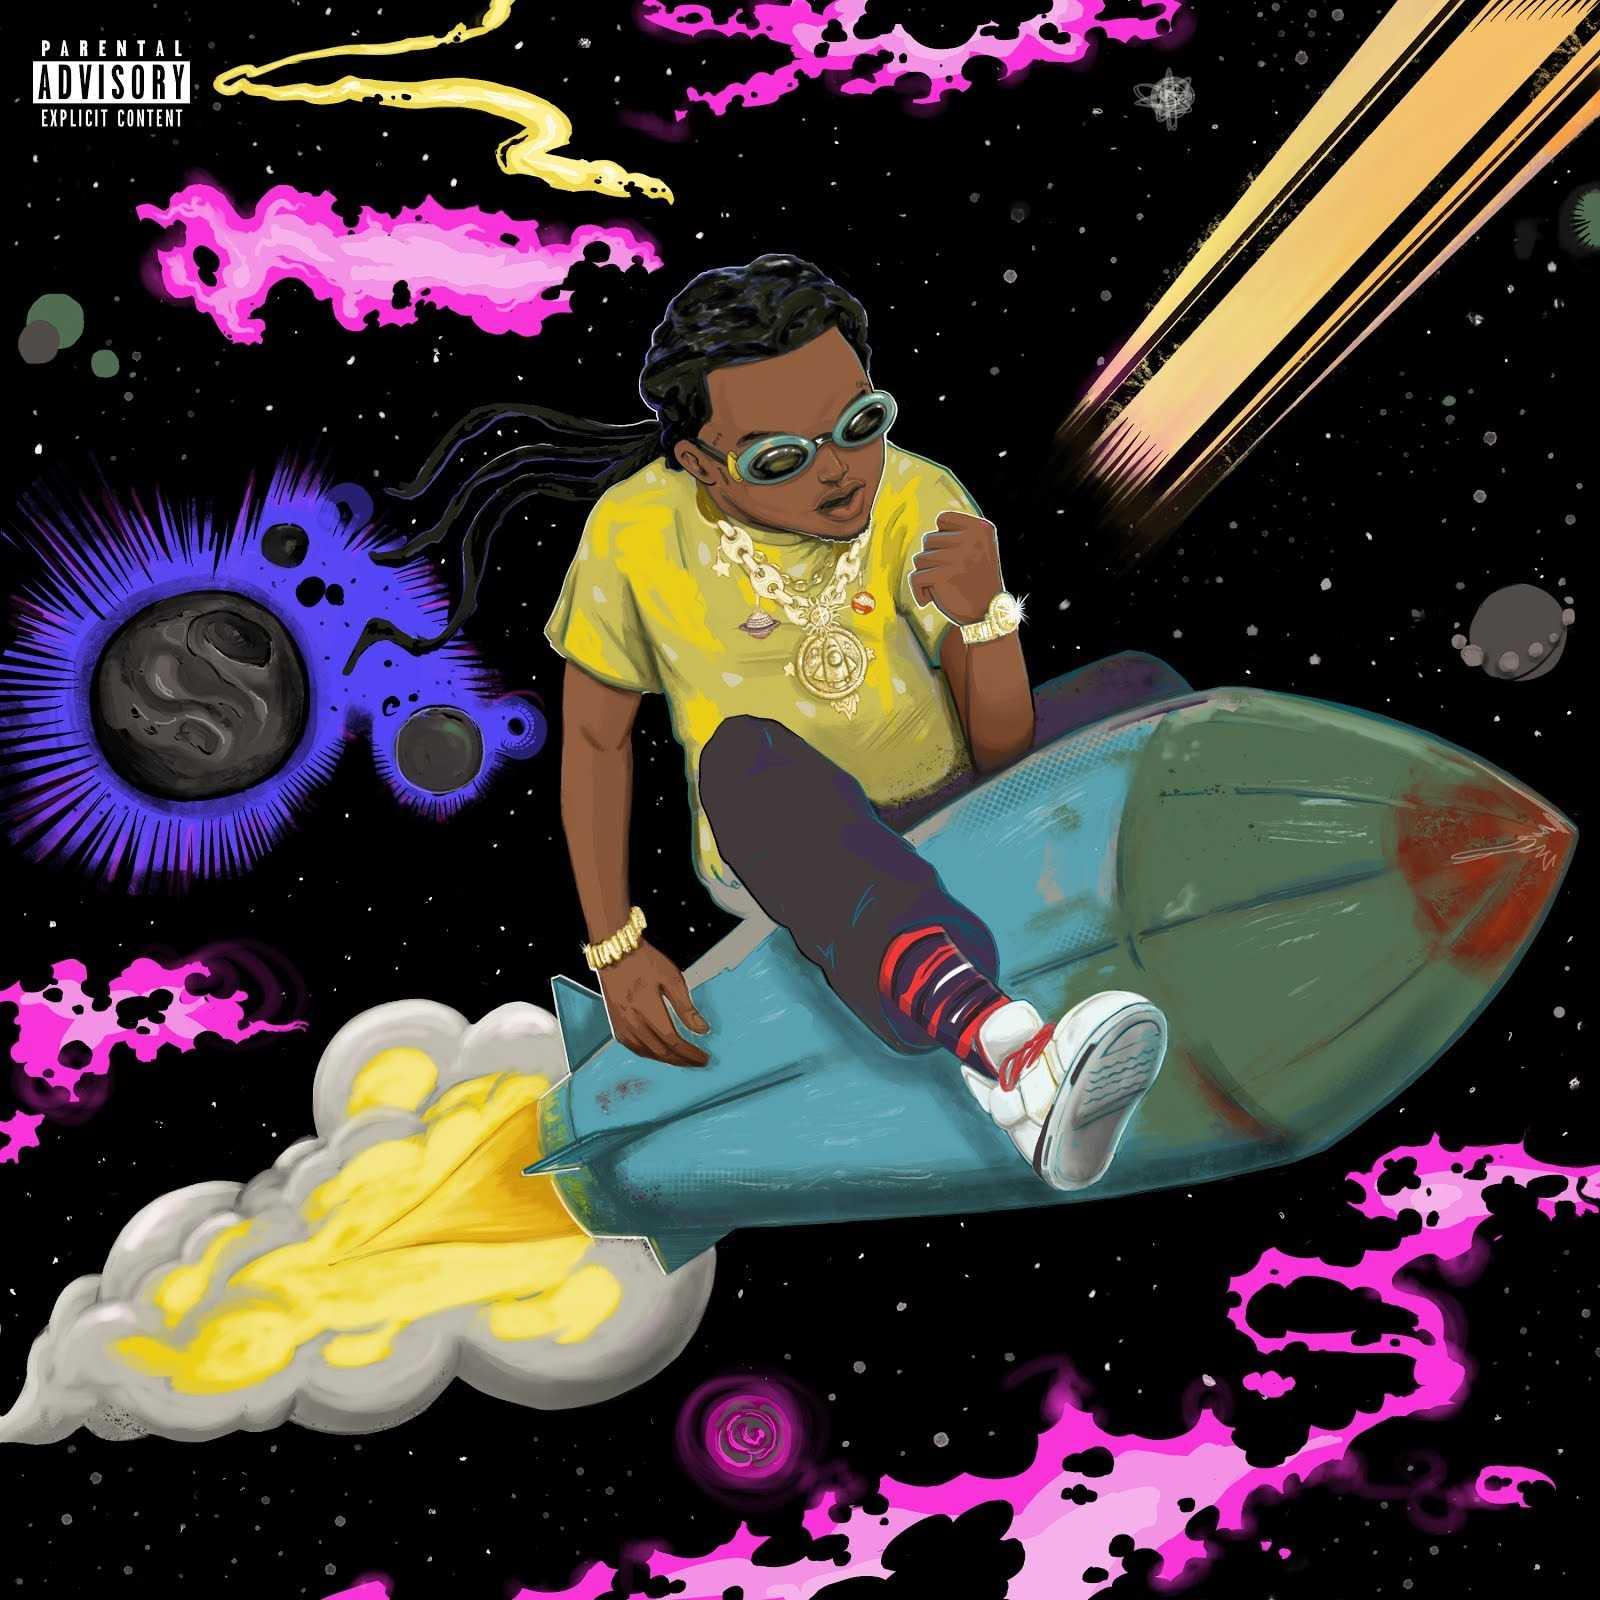 Album Stream: Takeoff | The Last Rocket [Audio]